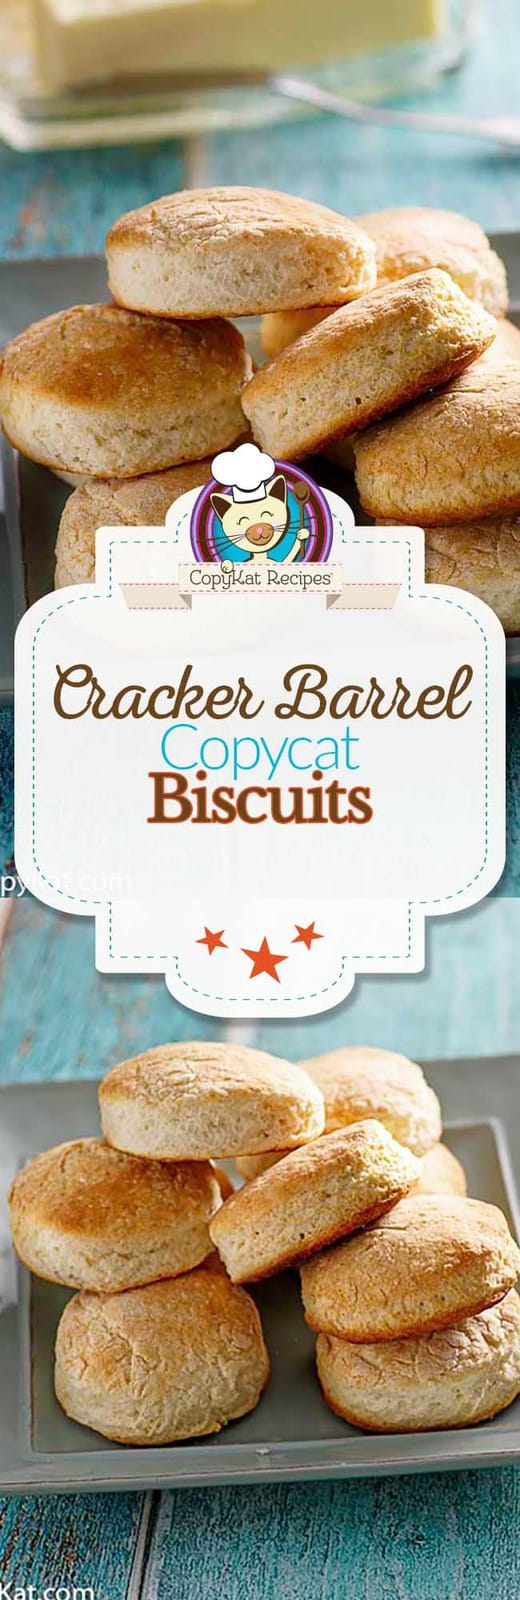 Recreate Cracker Barrel Biscuits at home with this easy copycat recipe. #copycat #copycatrecipe #biscuit #homemade